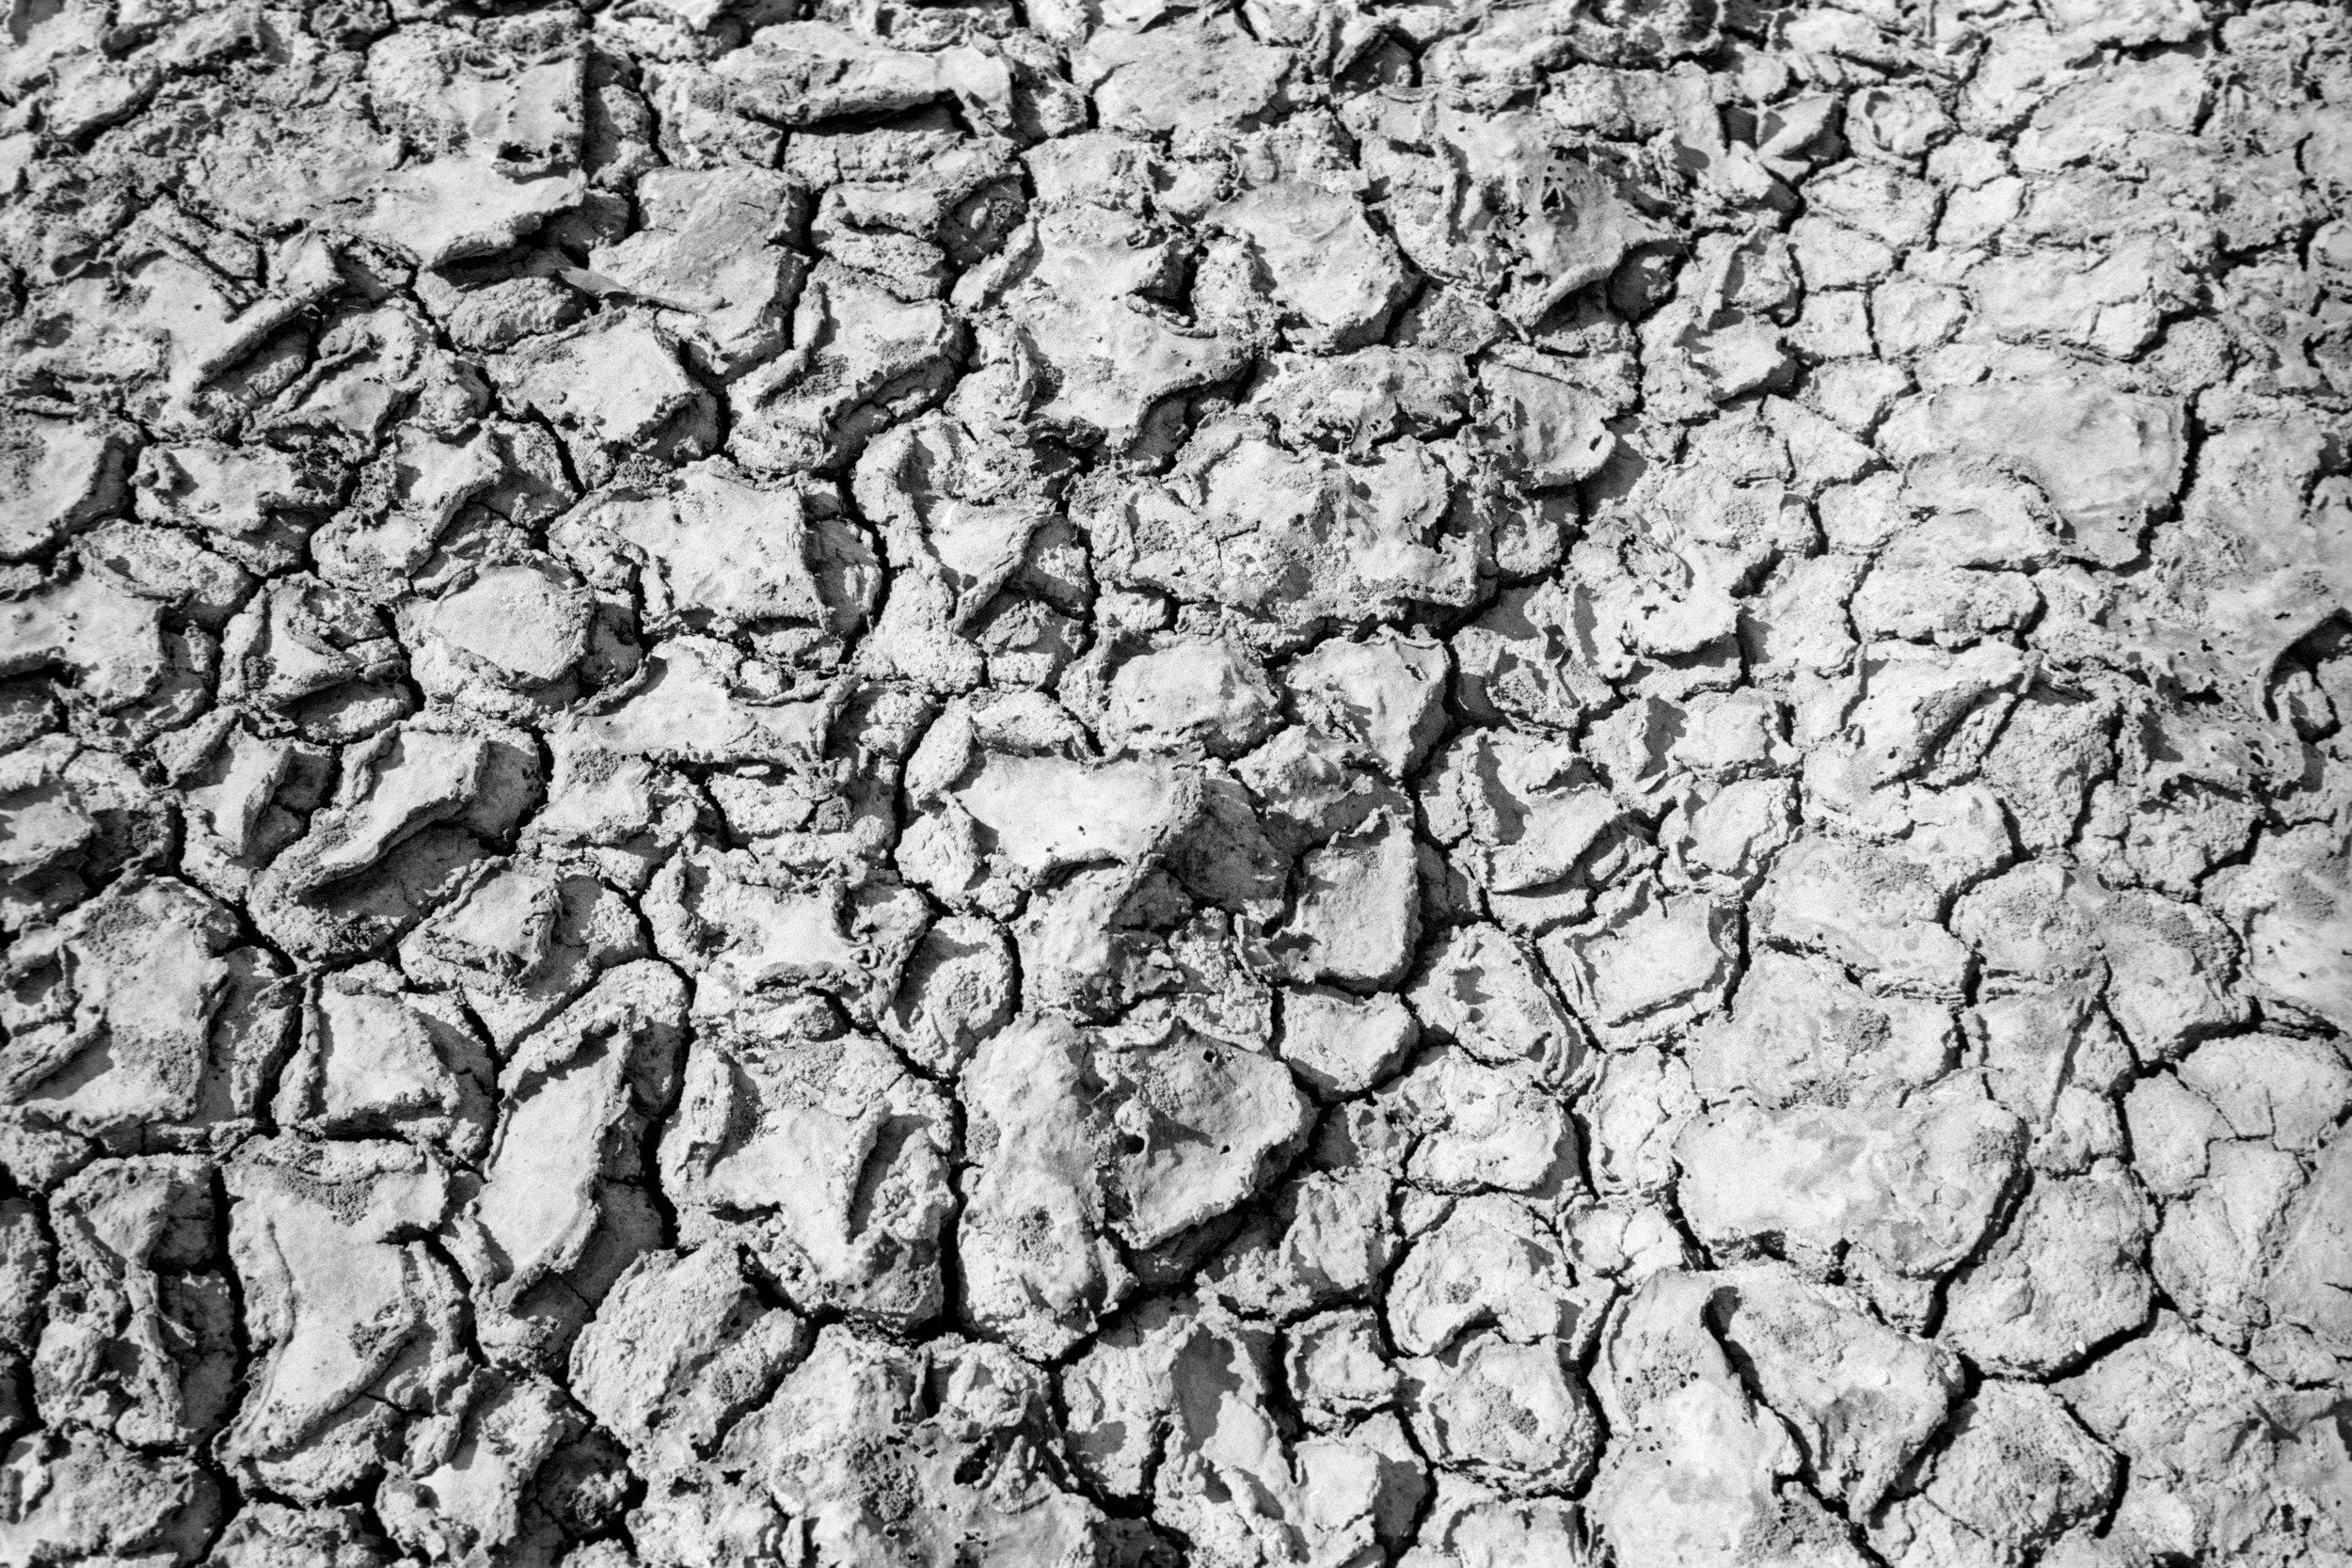 Textures of the ground beneath our feet. Kodak XX-5222, Leica M6 w/ 35mm f/2.5 (Elijah Clarke).